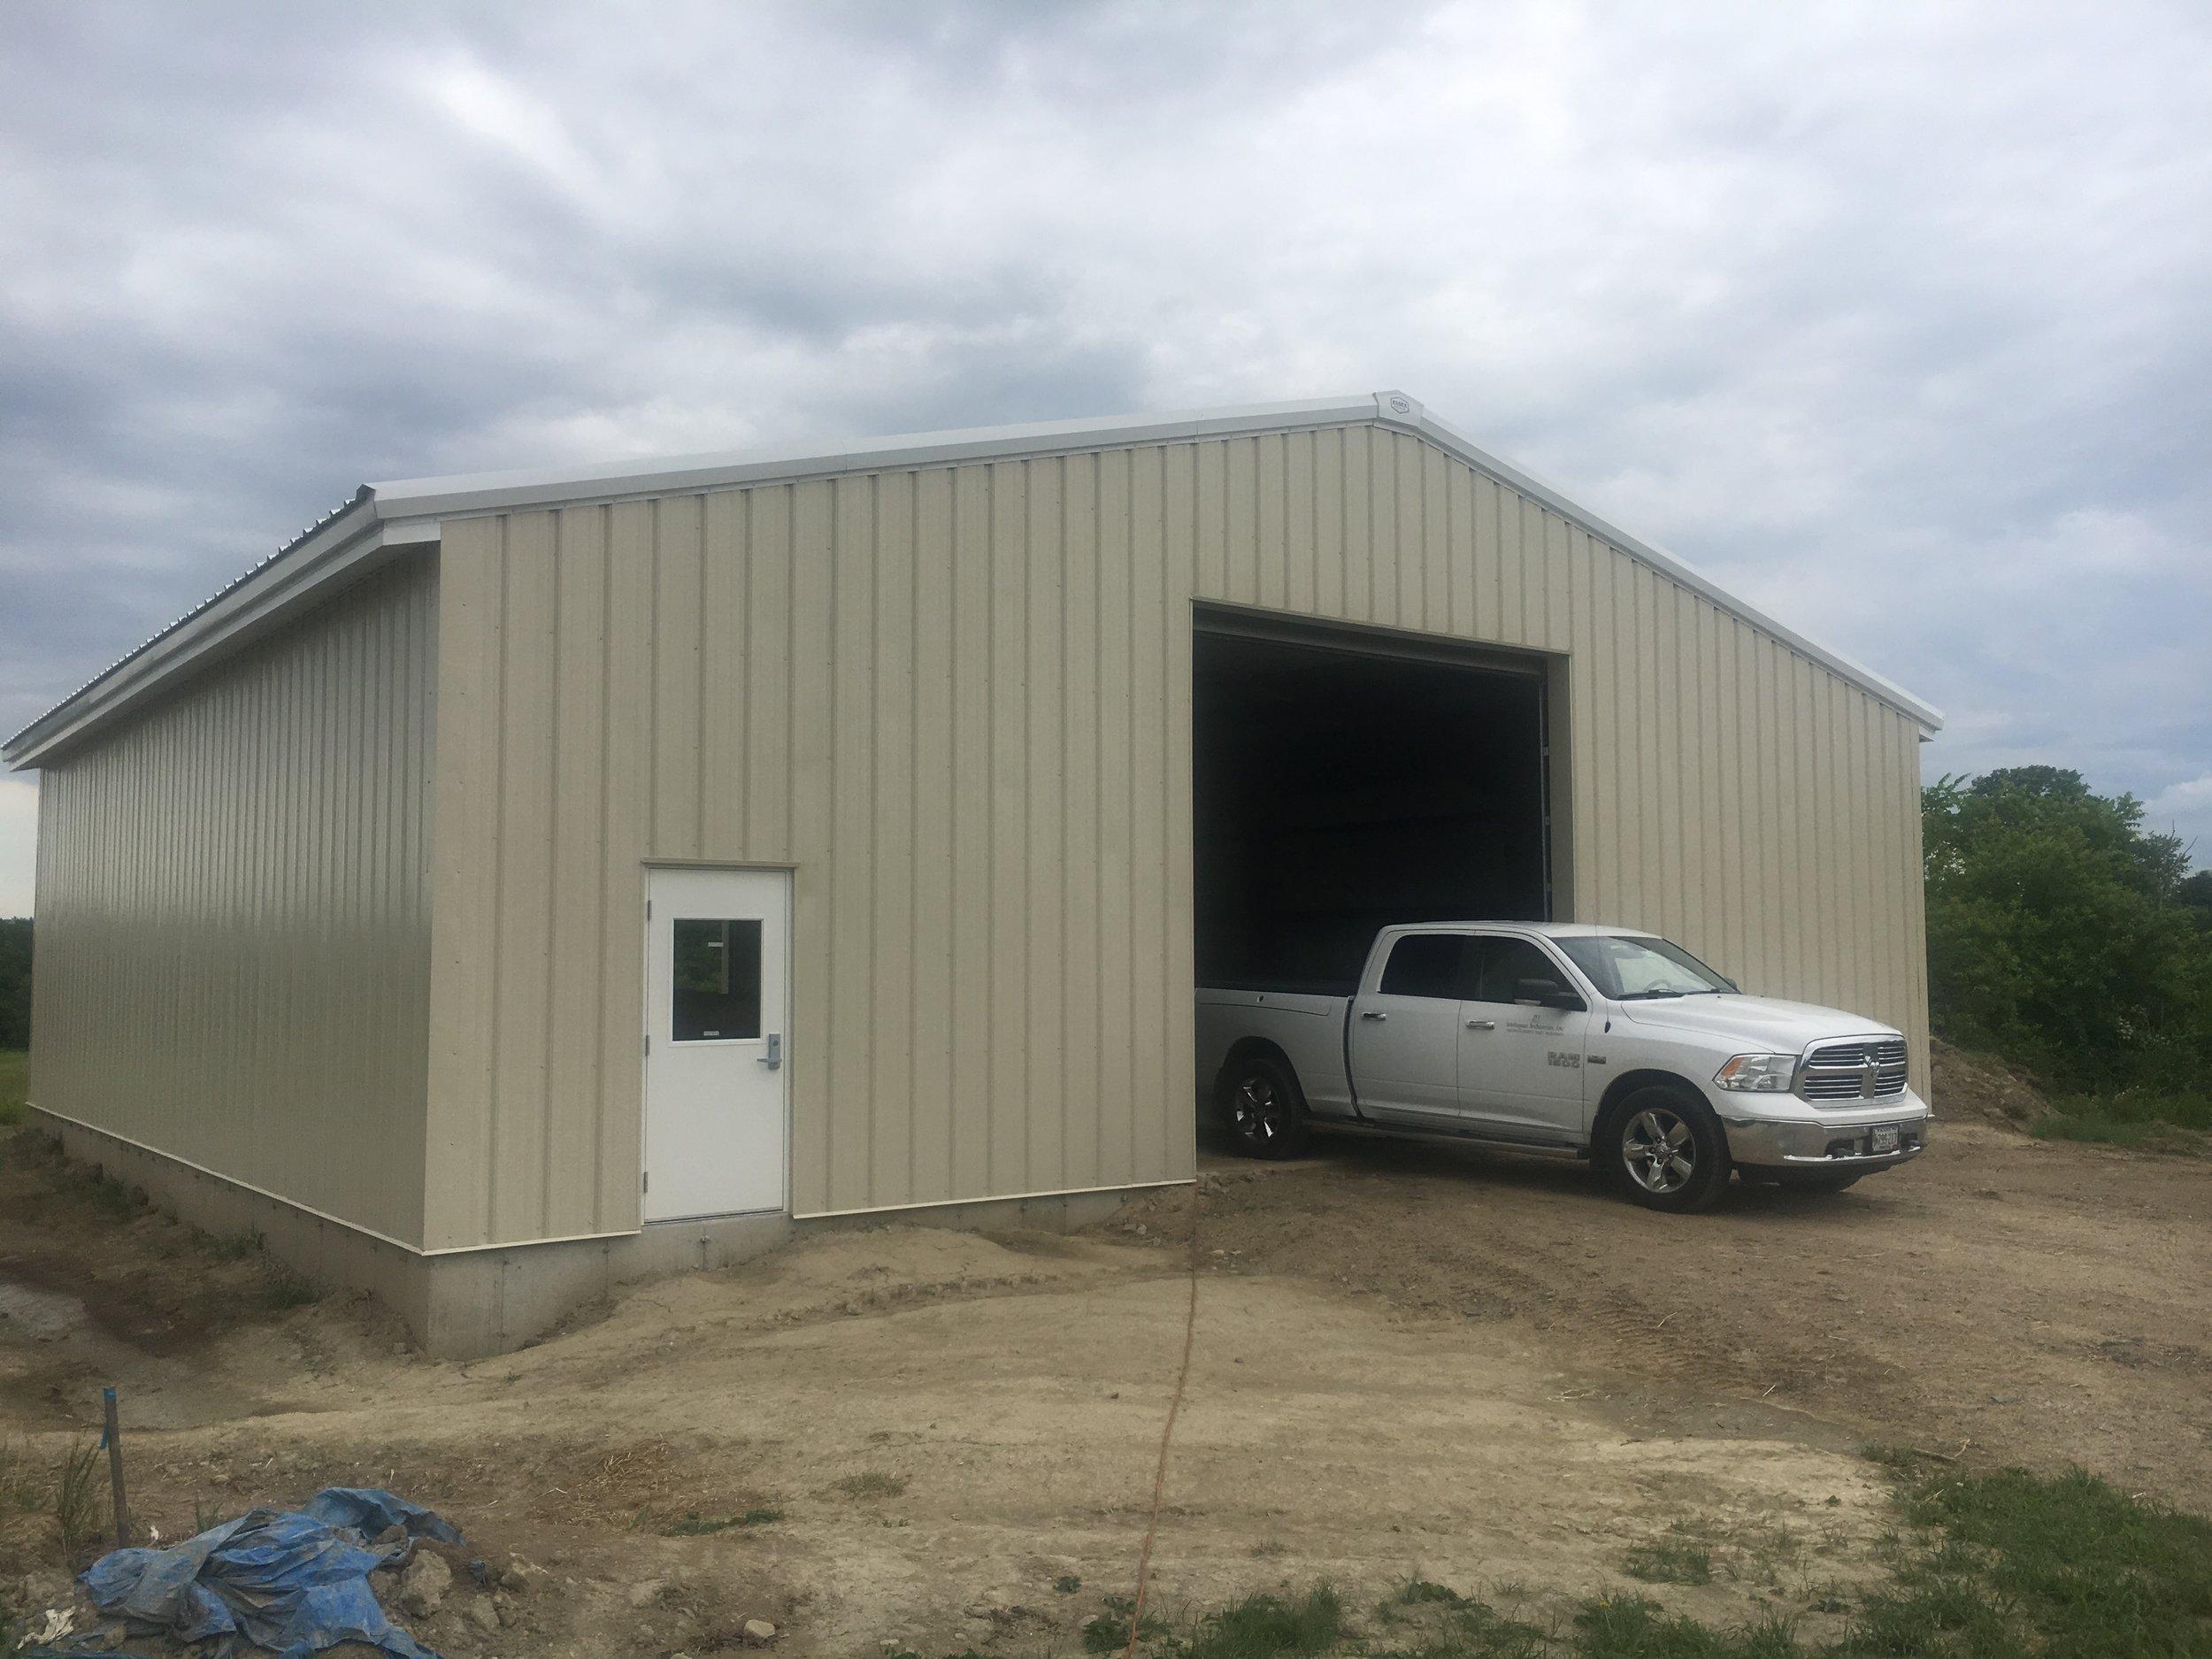 New Beginnings Farm(ARUNDEL, ME) -